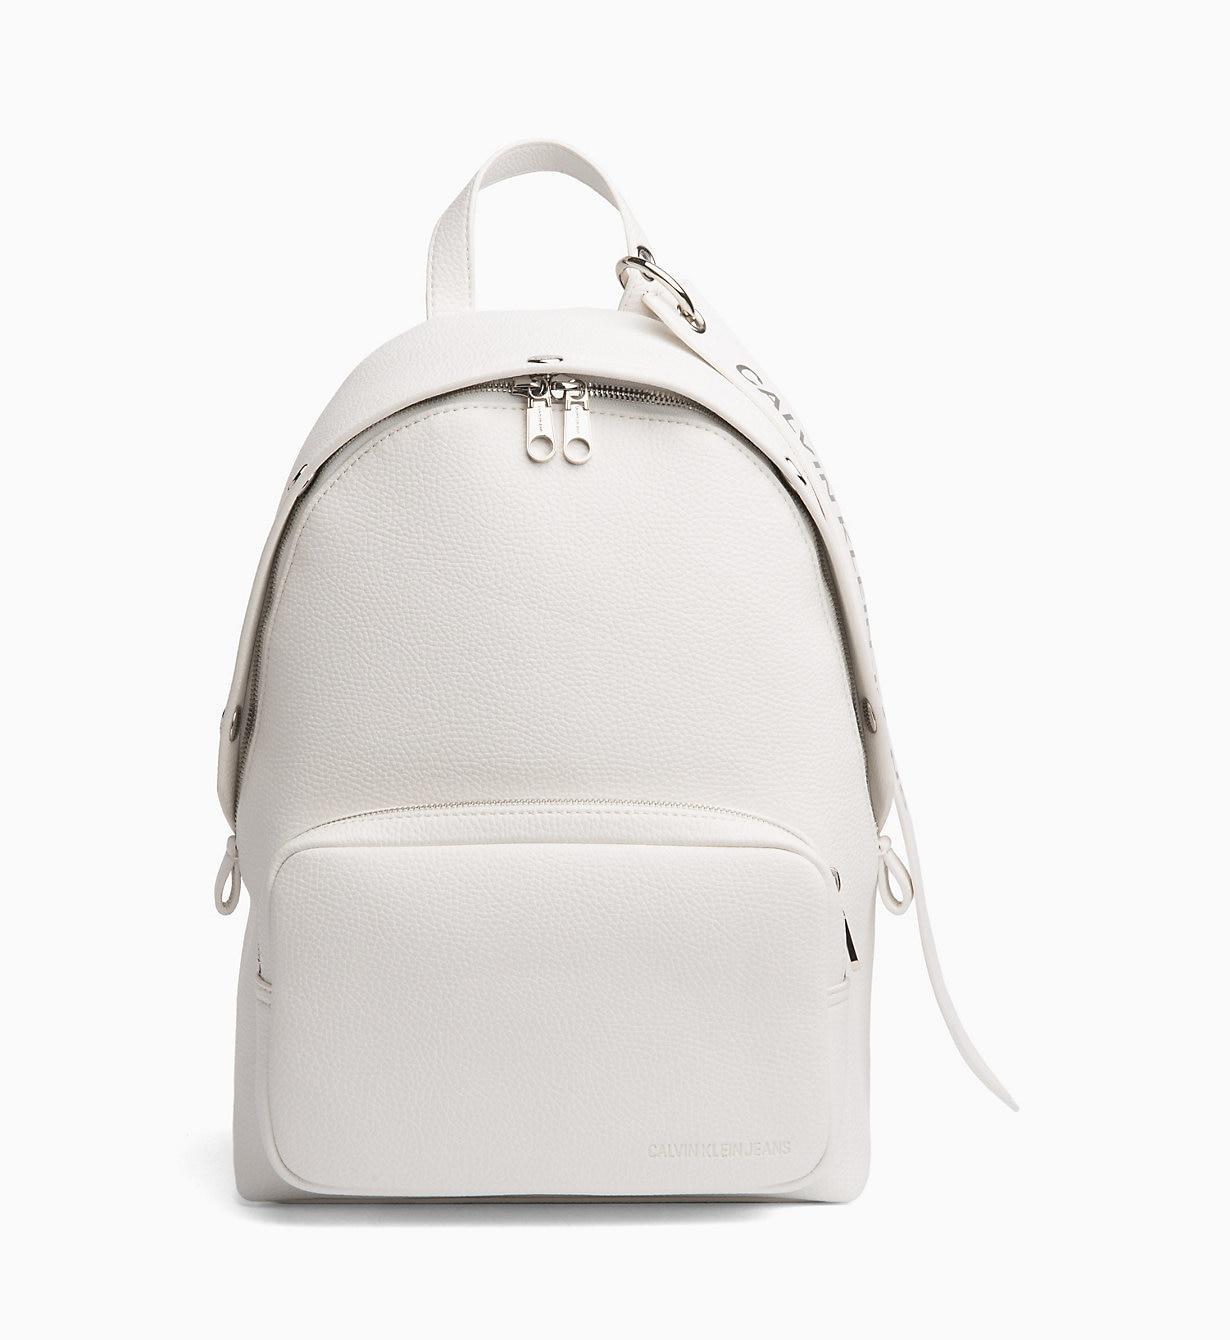 62cc6ad2fc1 Calvin Klein Medium Logo Banner Backpack in White - Lyst